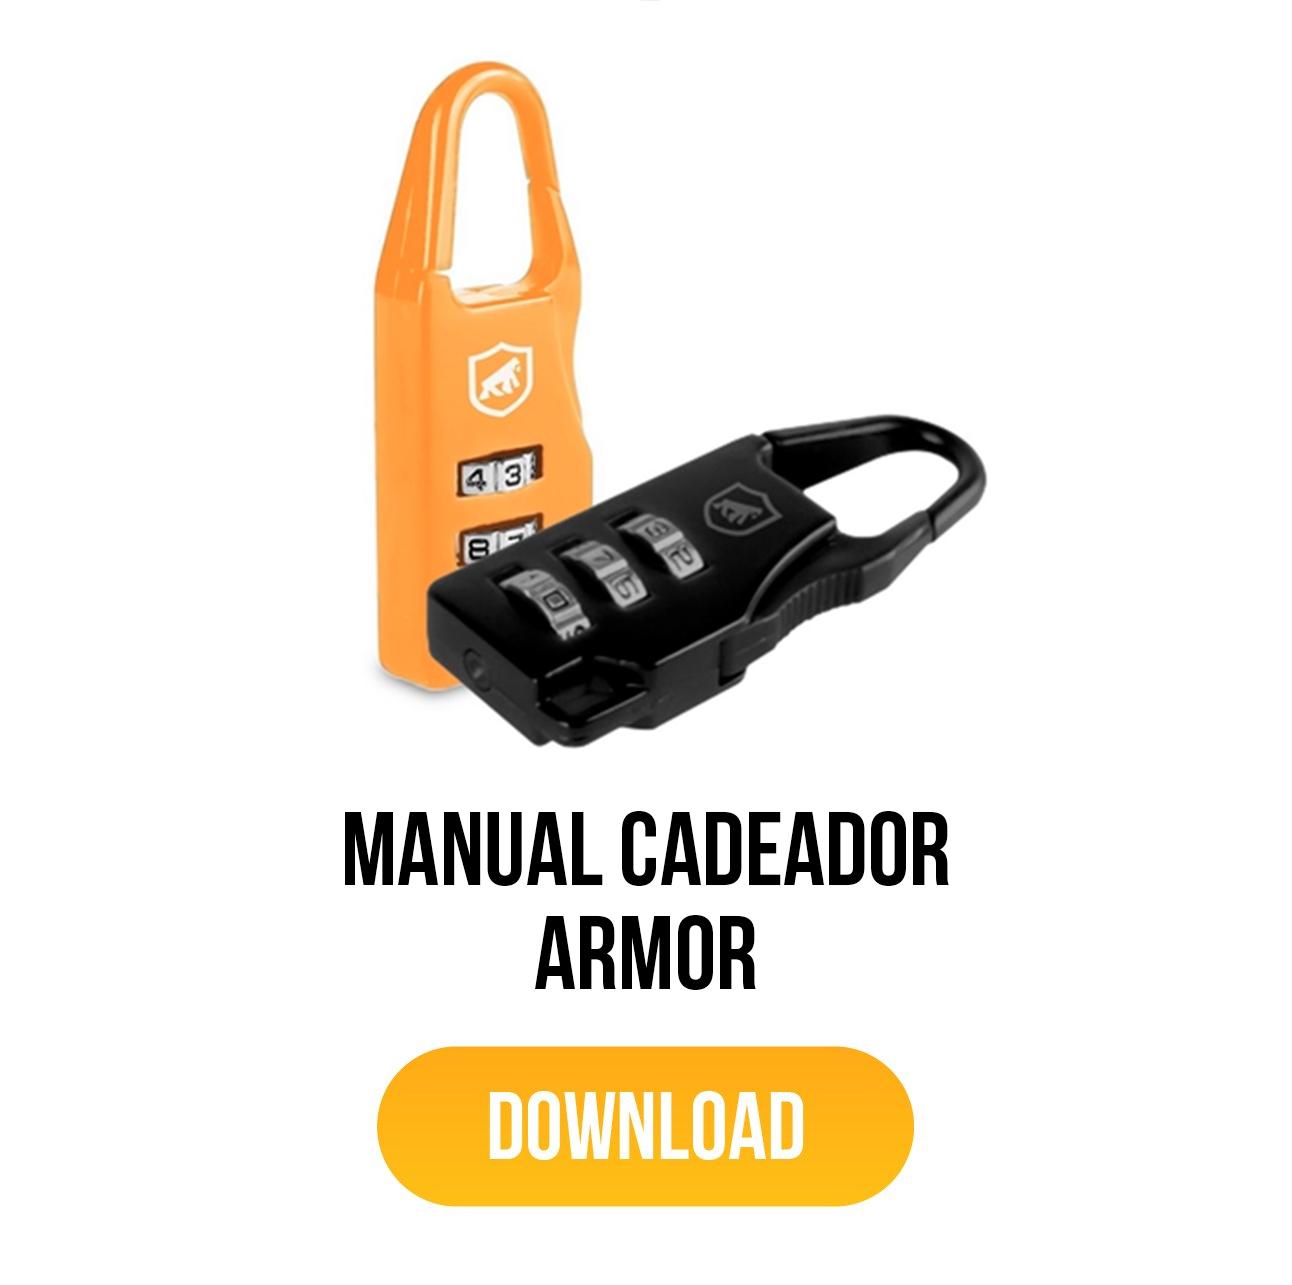 manual para cadeado armor